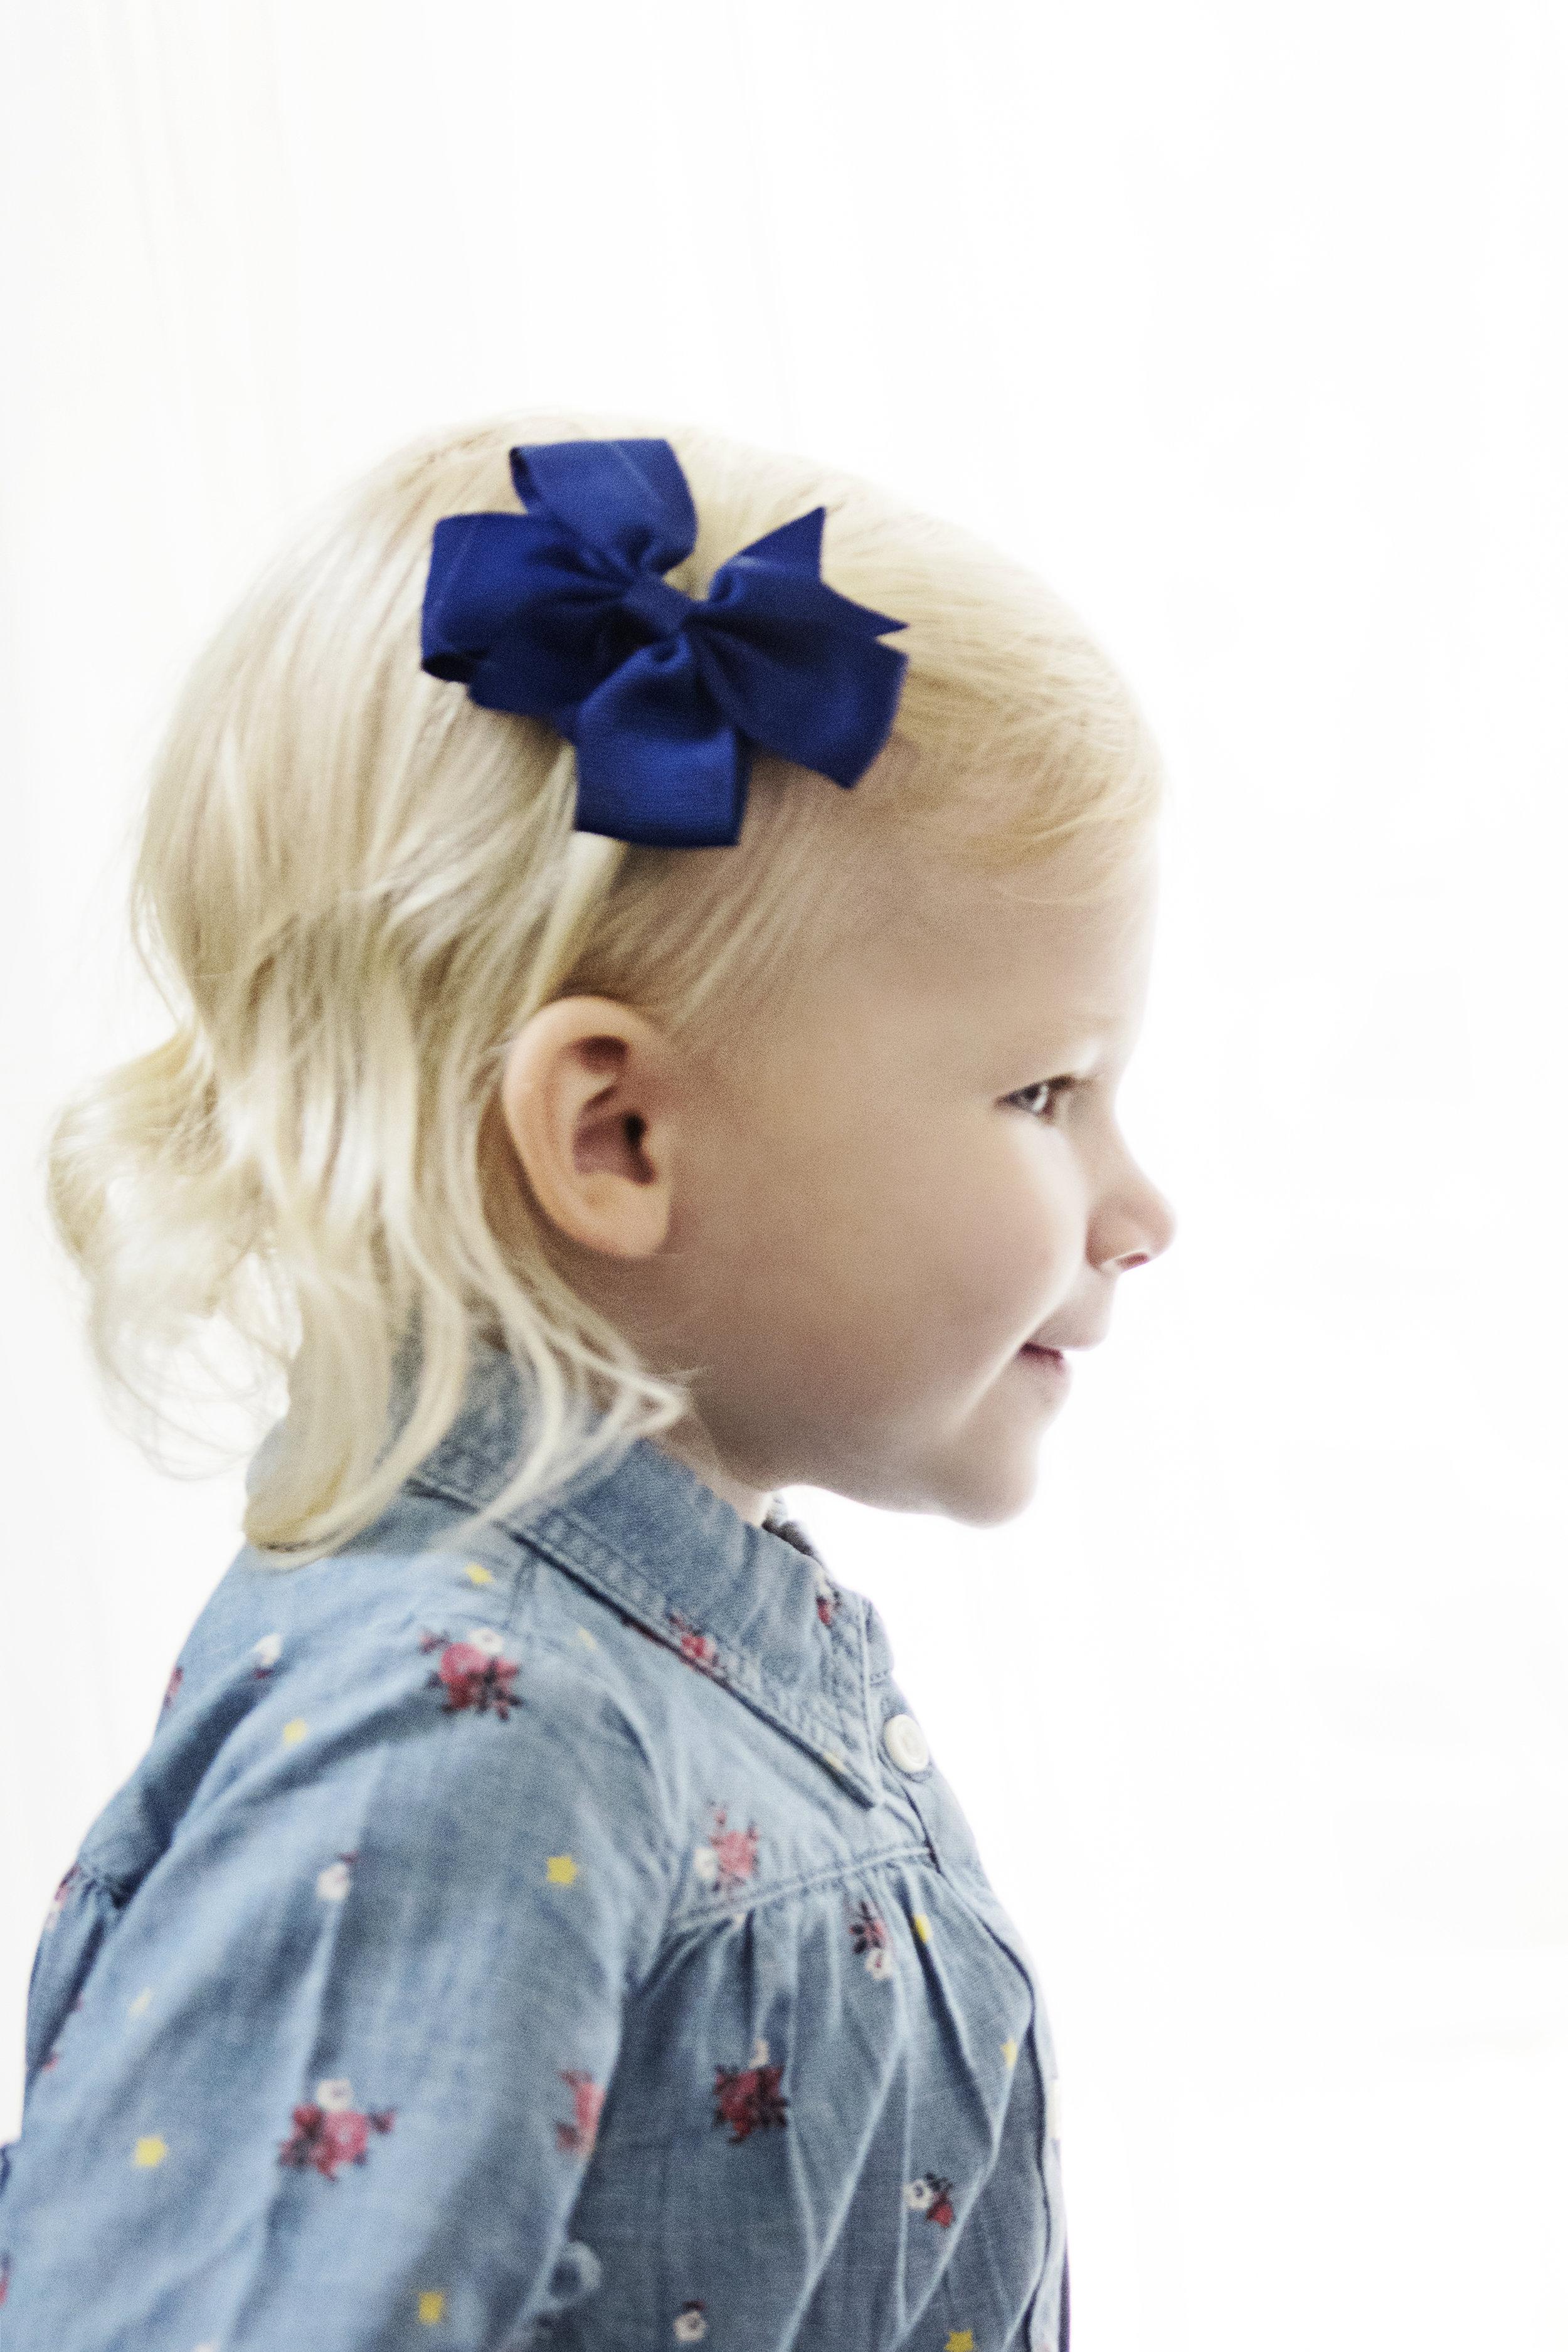 Heirloom Portrait of a Toddler